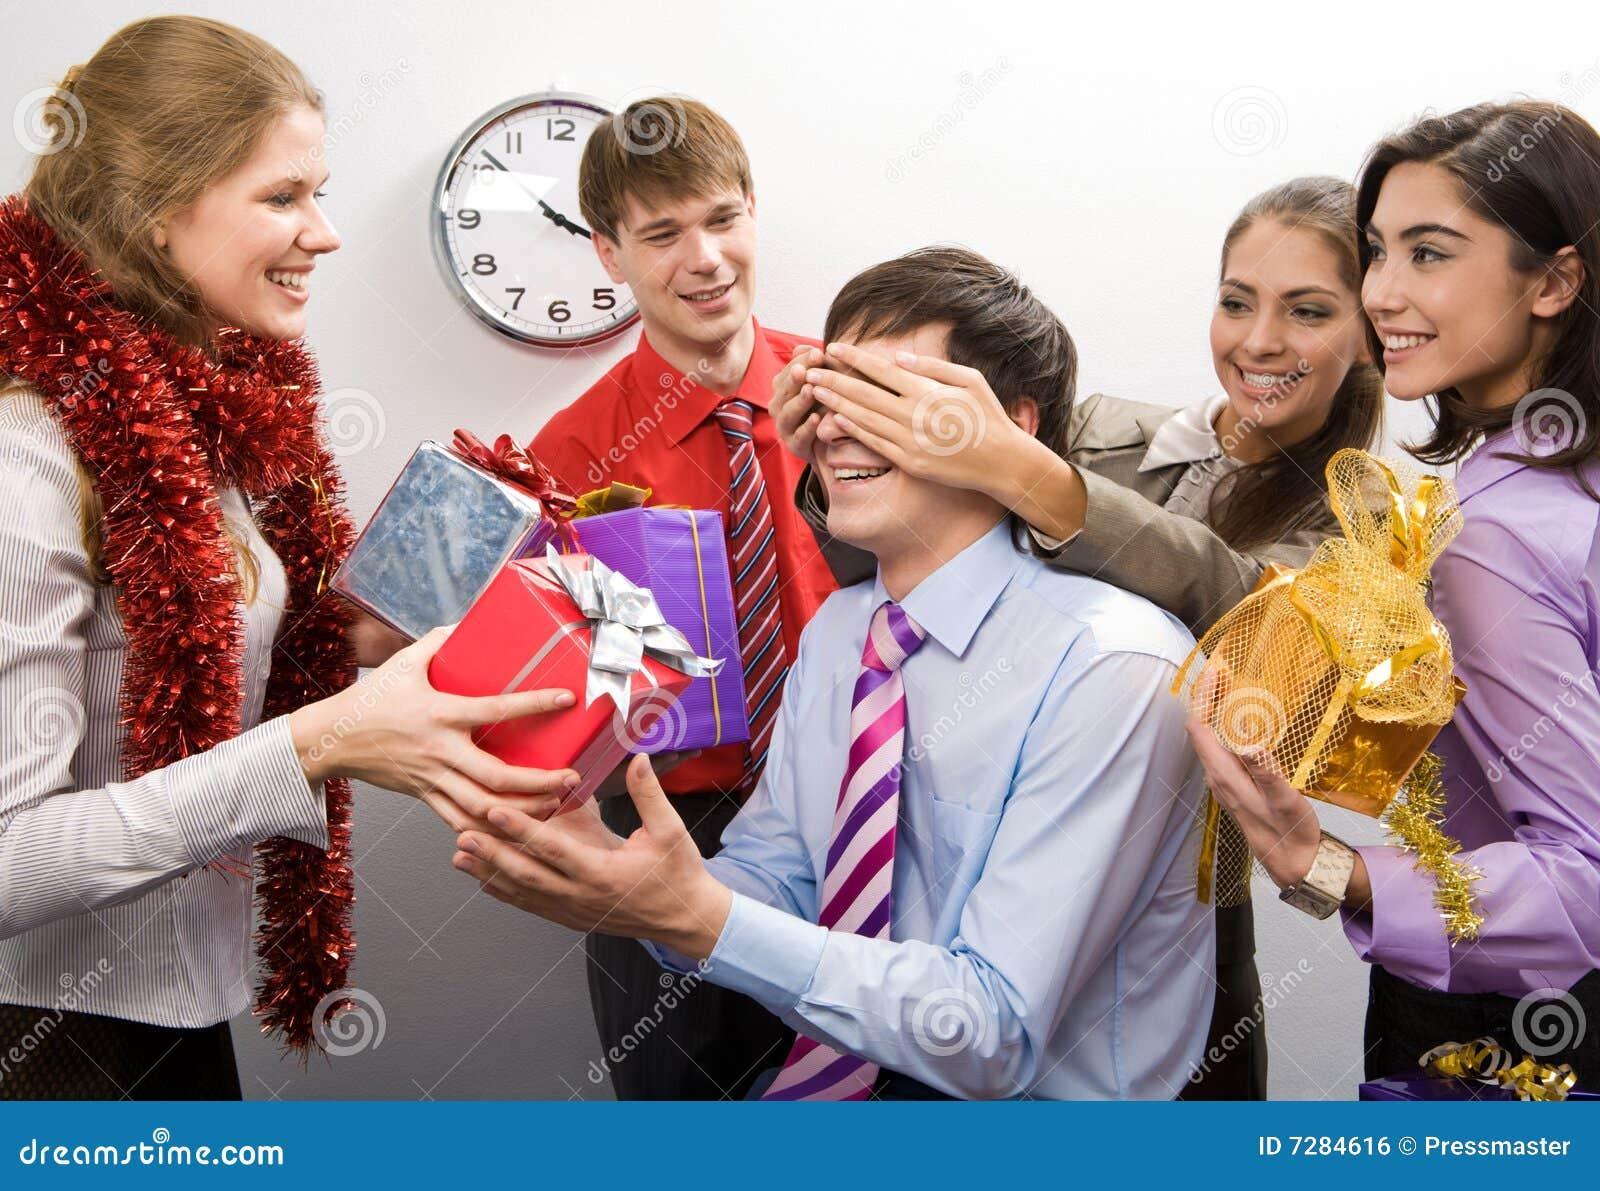 Секс сотрудников на корпоративе 6 фотография